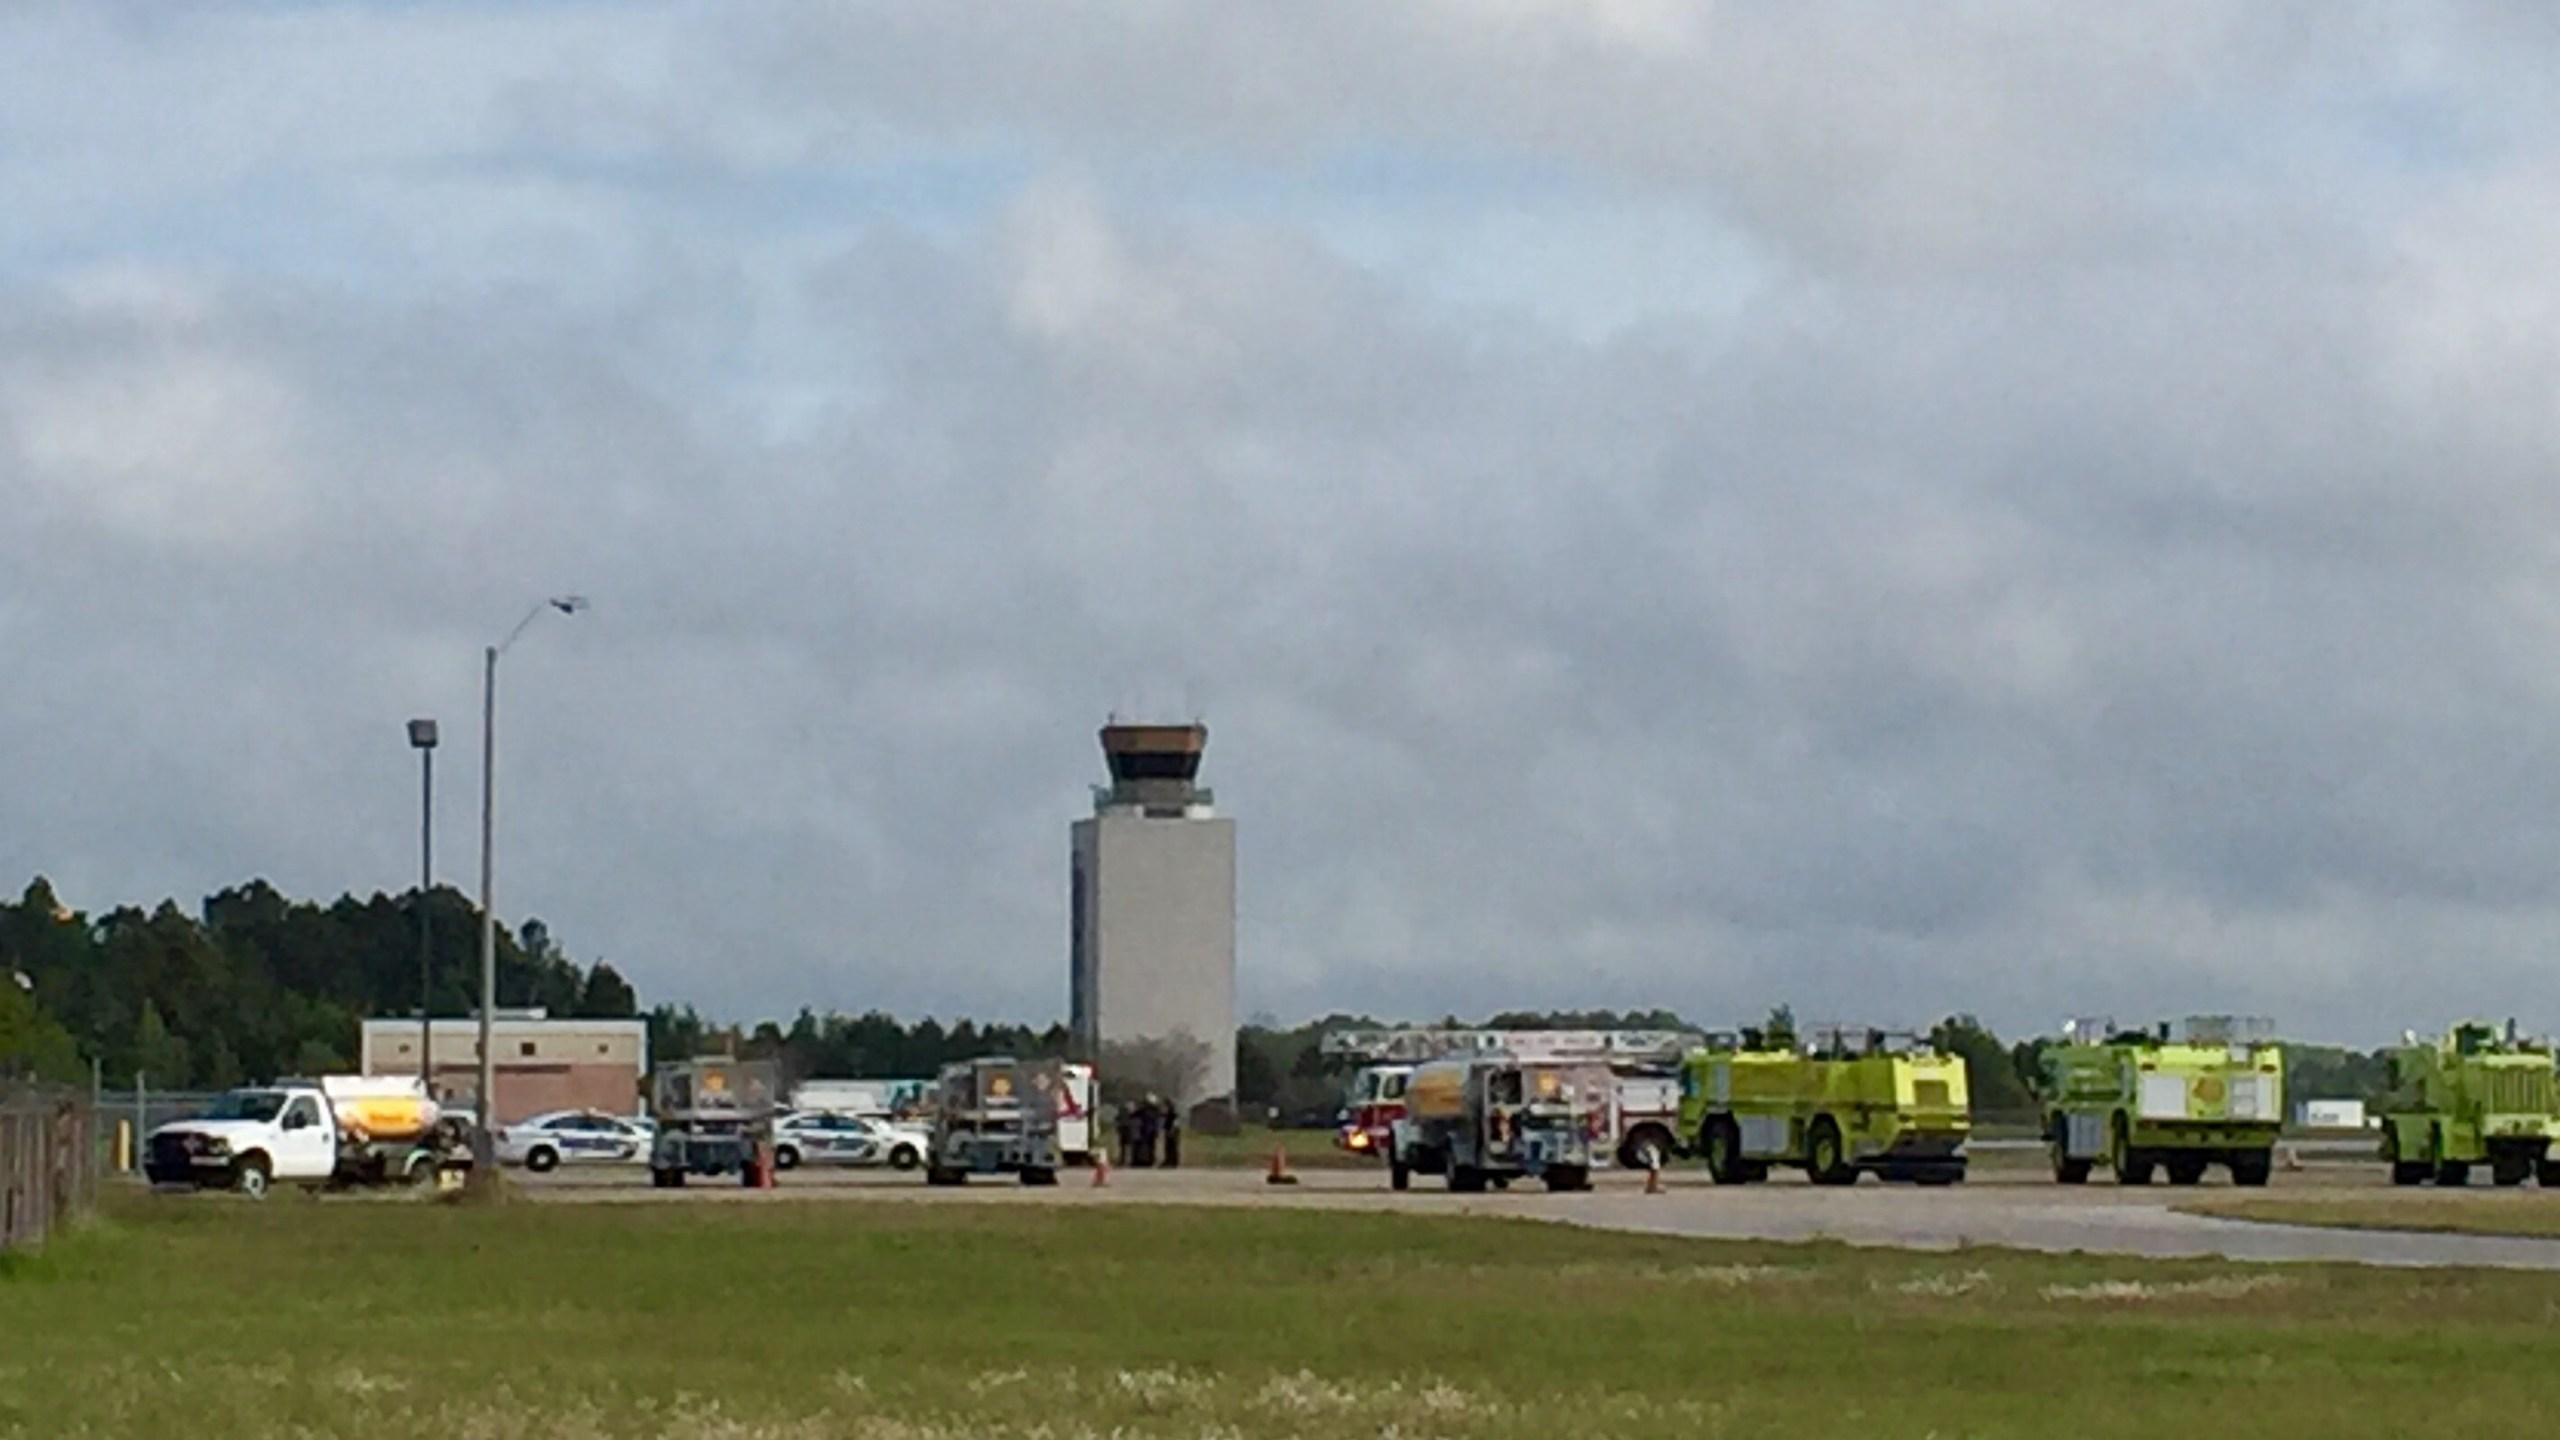 Airport_328734